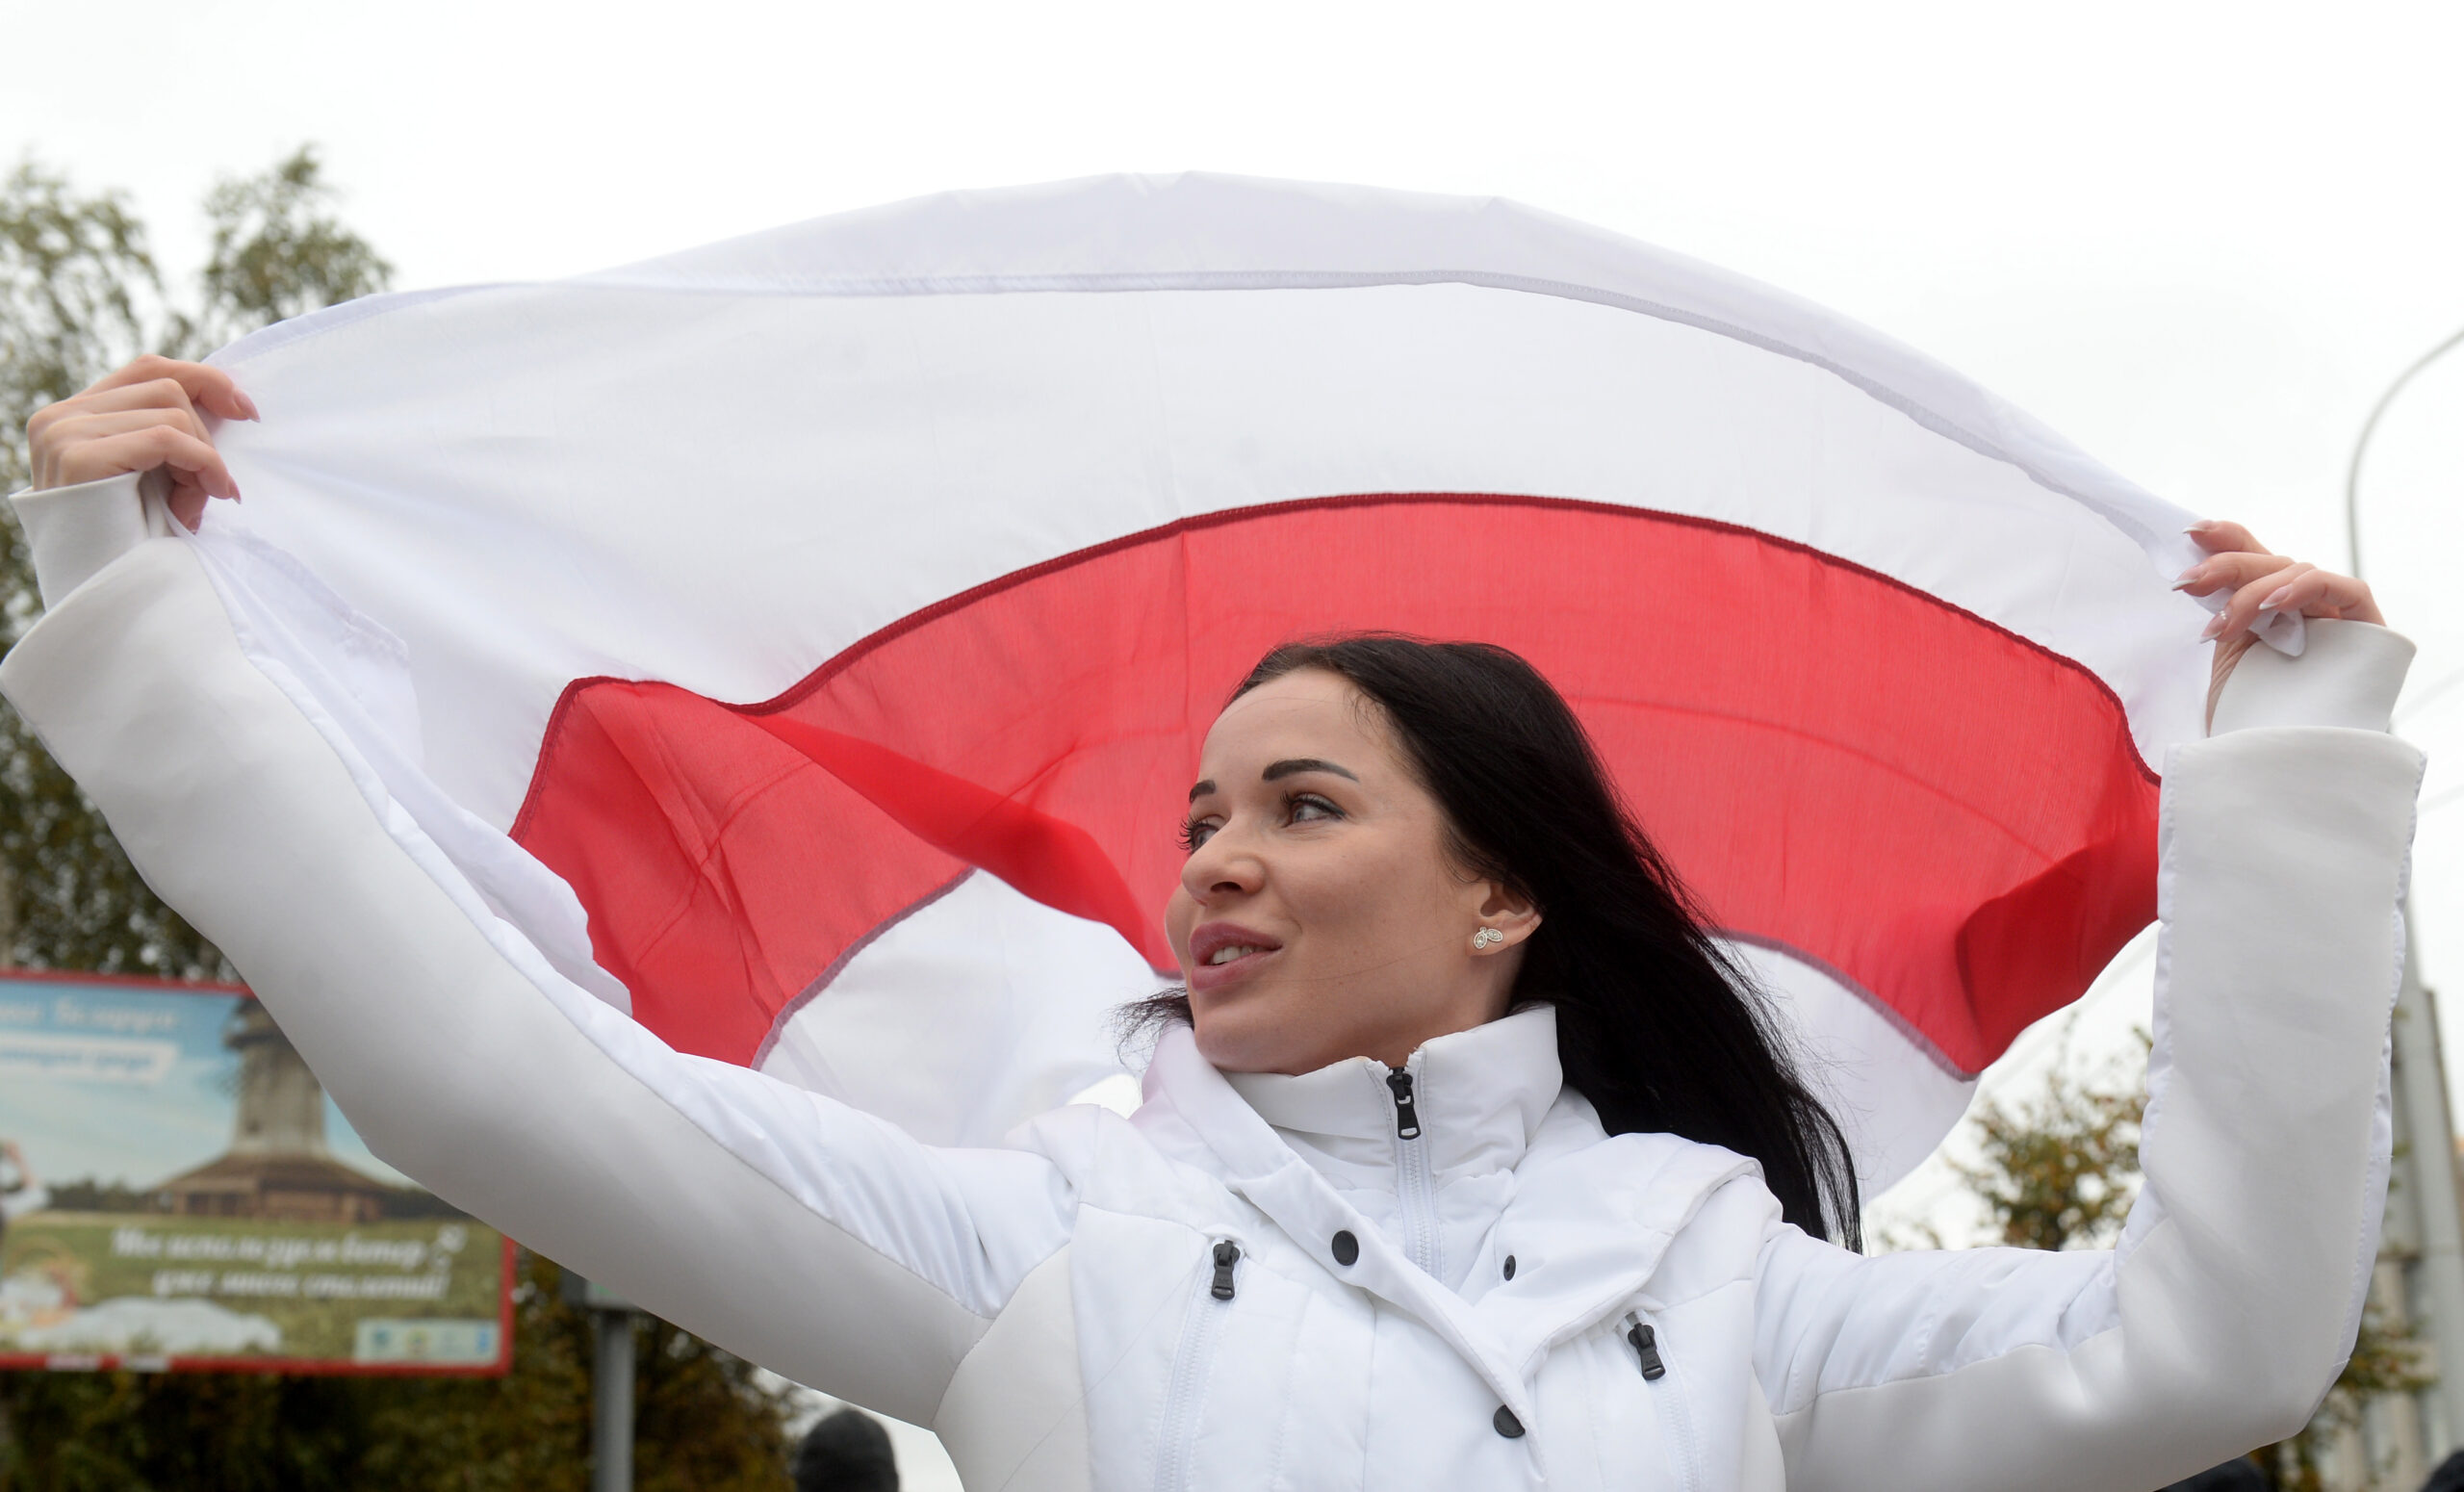 Mergina su vėliava